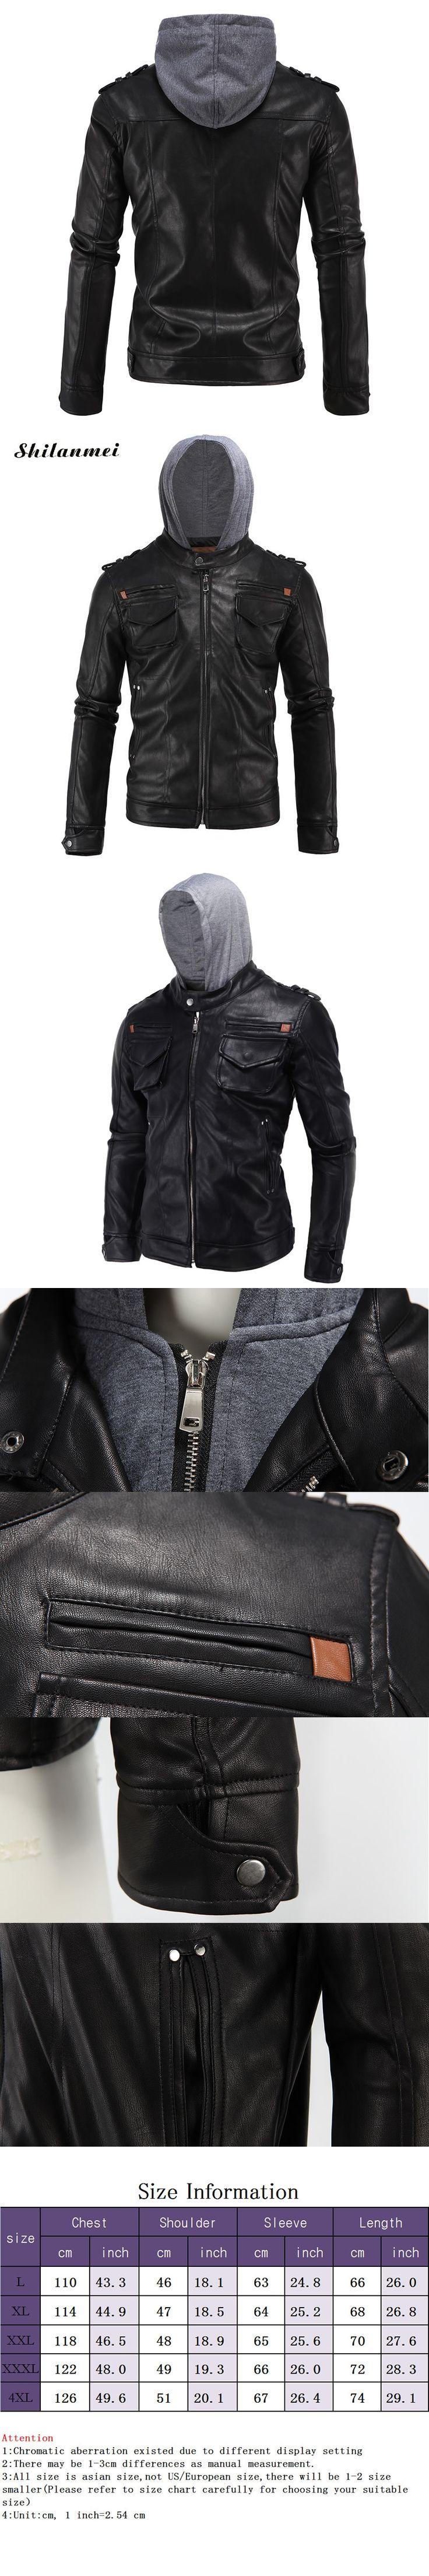 PU Men Coat 2018 European American Style Long Sleeves Fashion Winter Leather Jacket Coat Round Neck Solid Slim Fit Black Coat